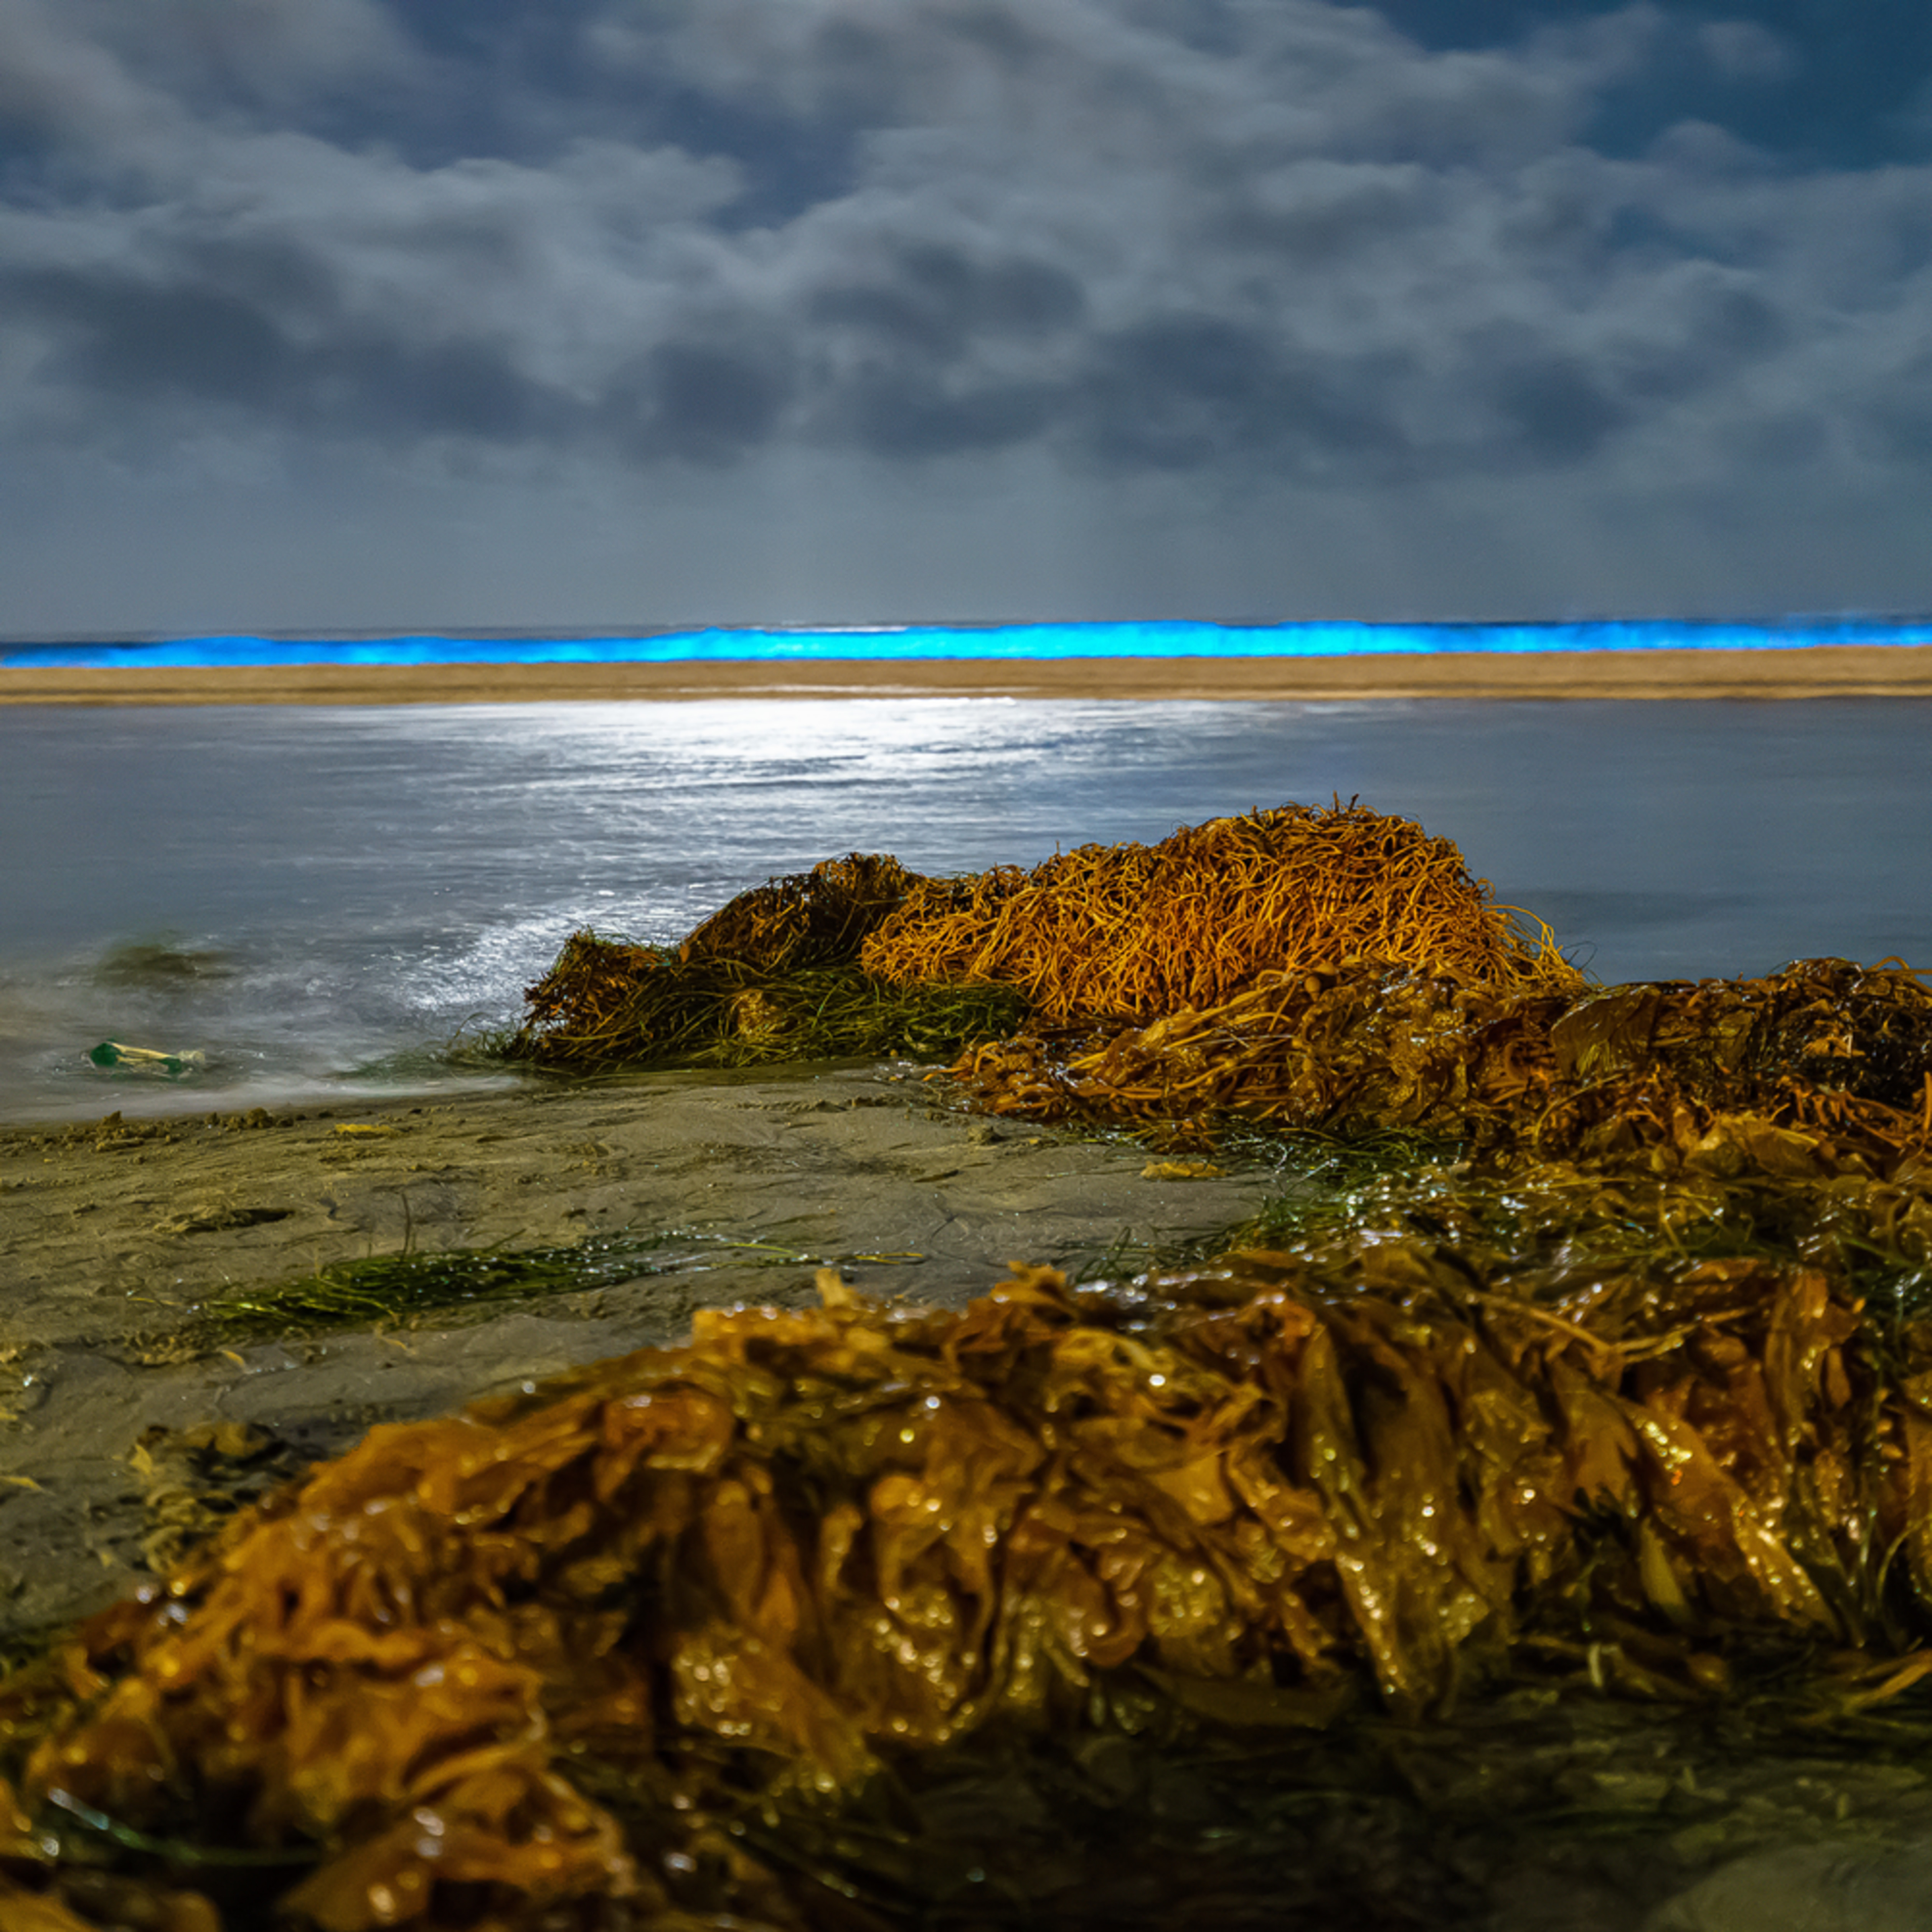 La jolla shores bio luminescence three 5 2 2020 zrys3c